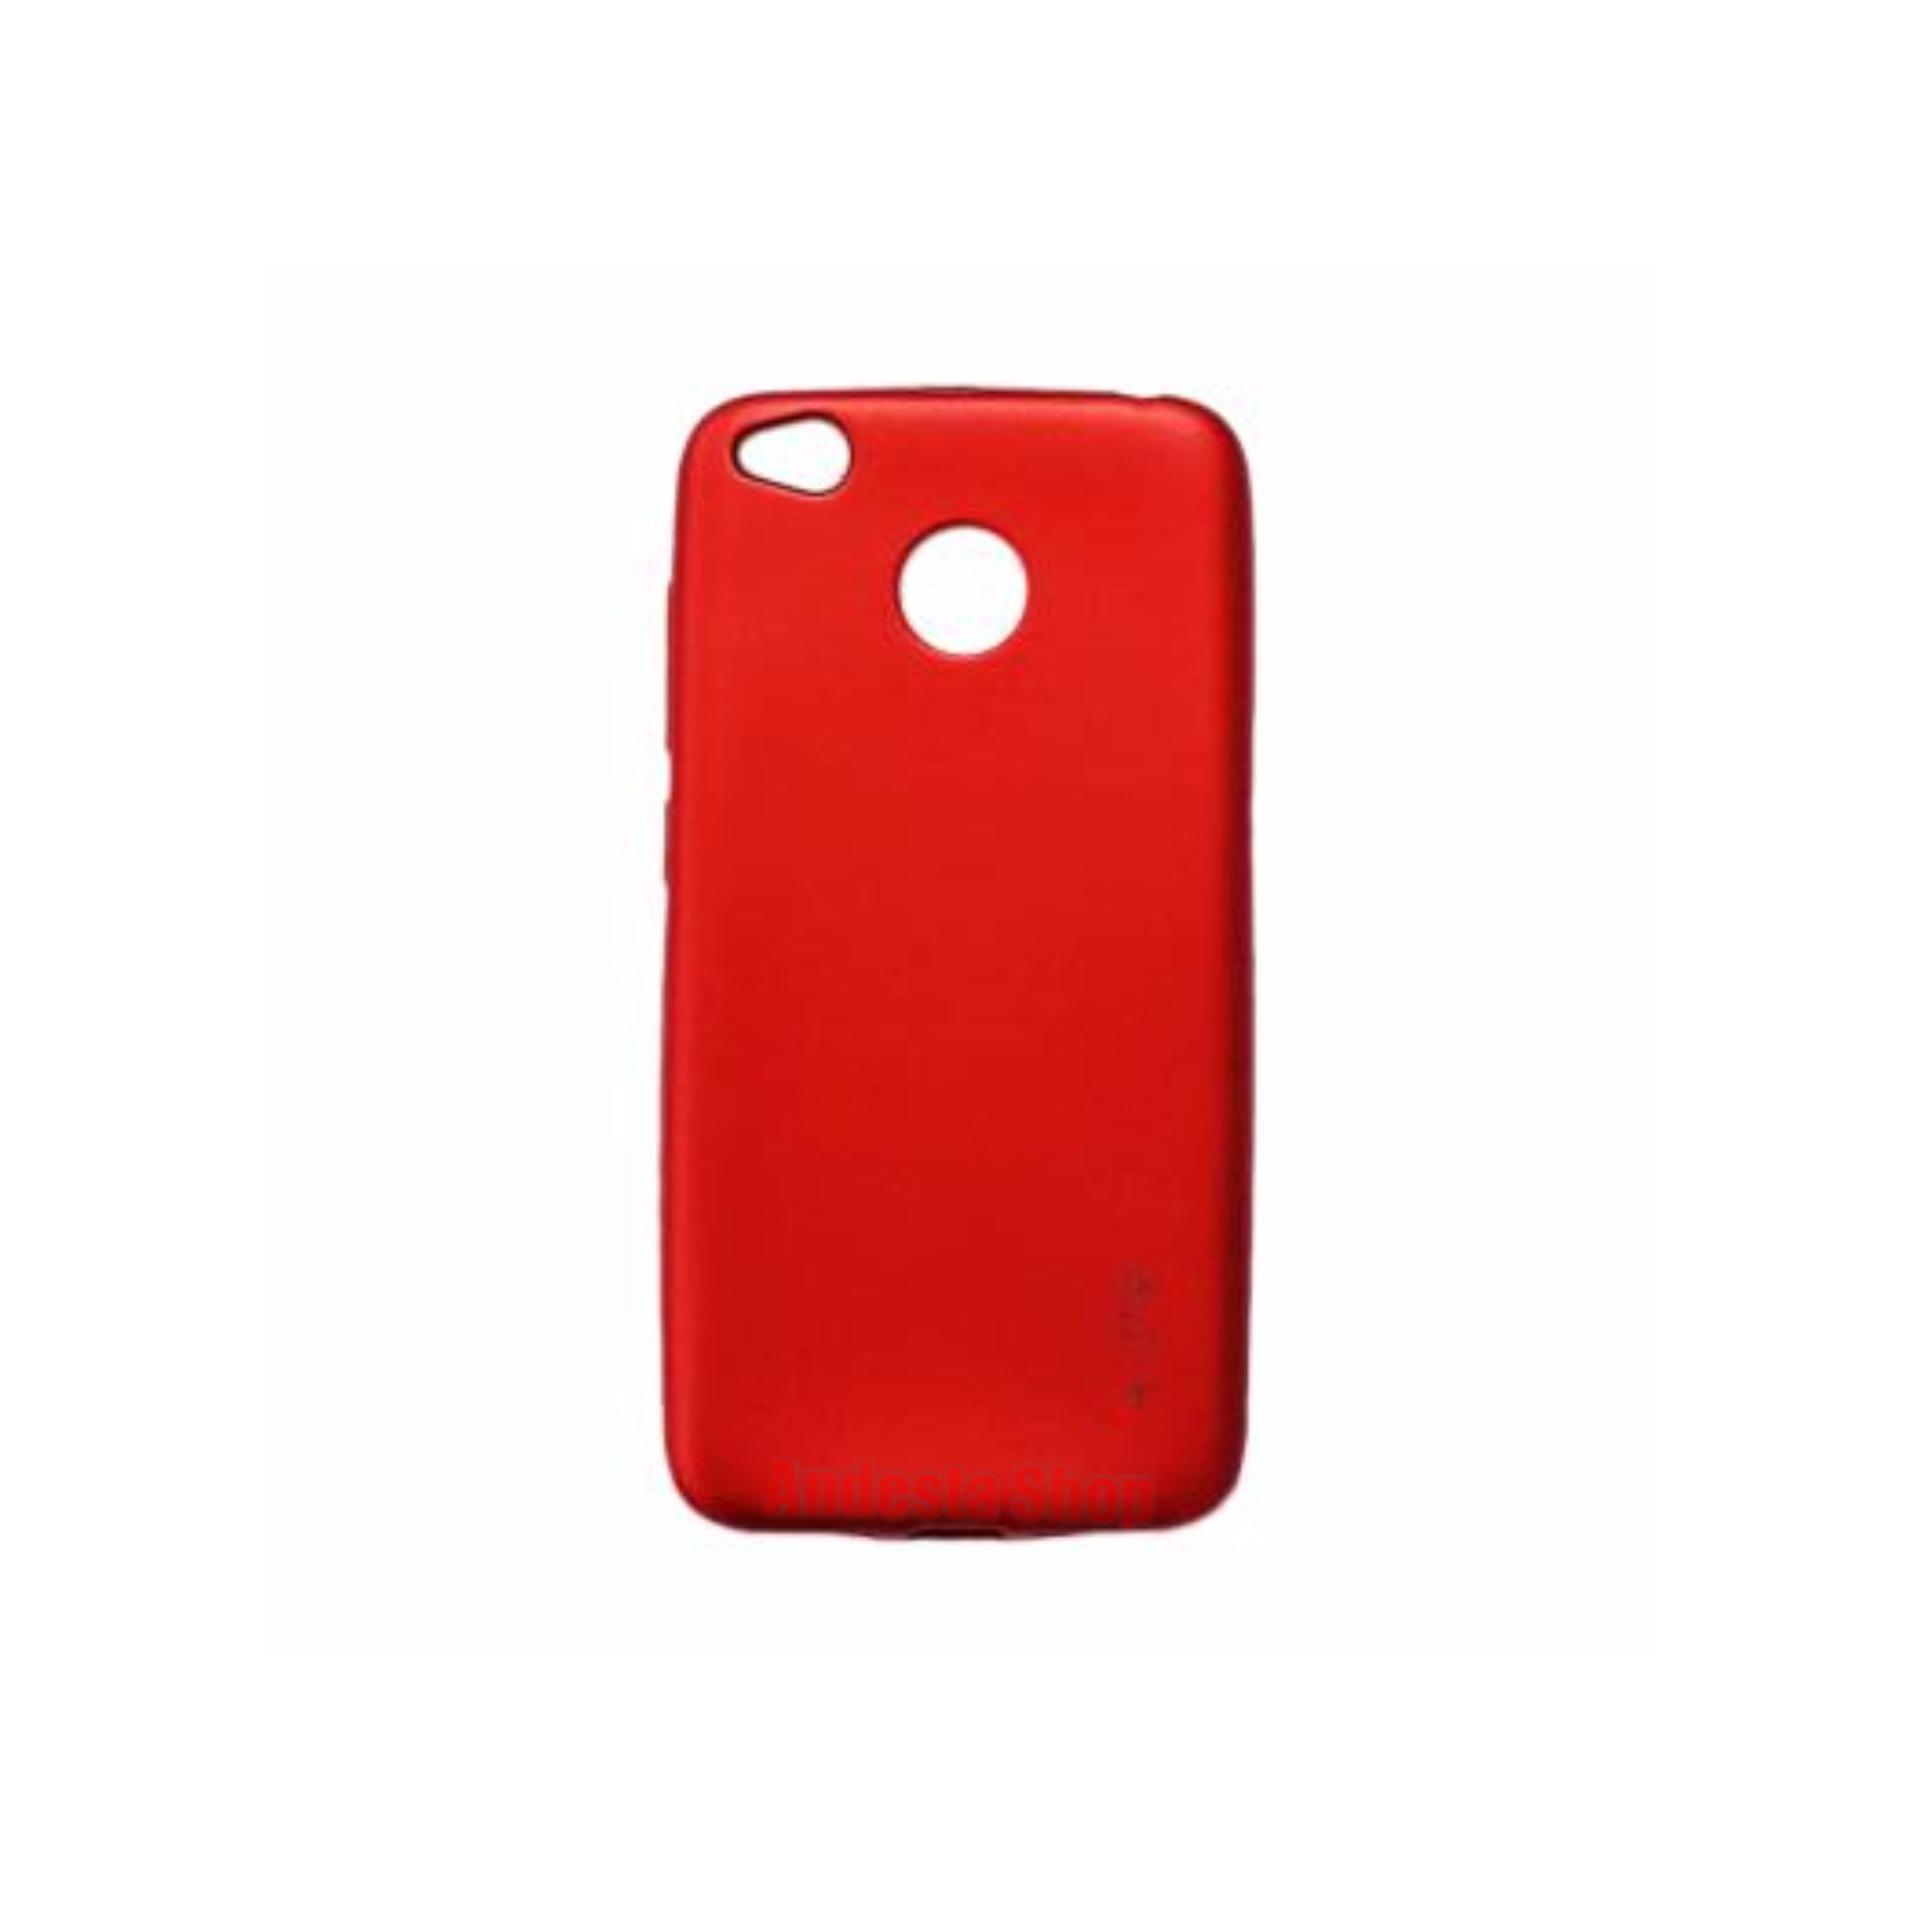 Case Hardcase Xiaomi Redmi 4X Free Tempered Glass .